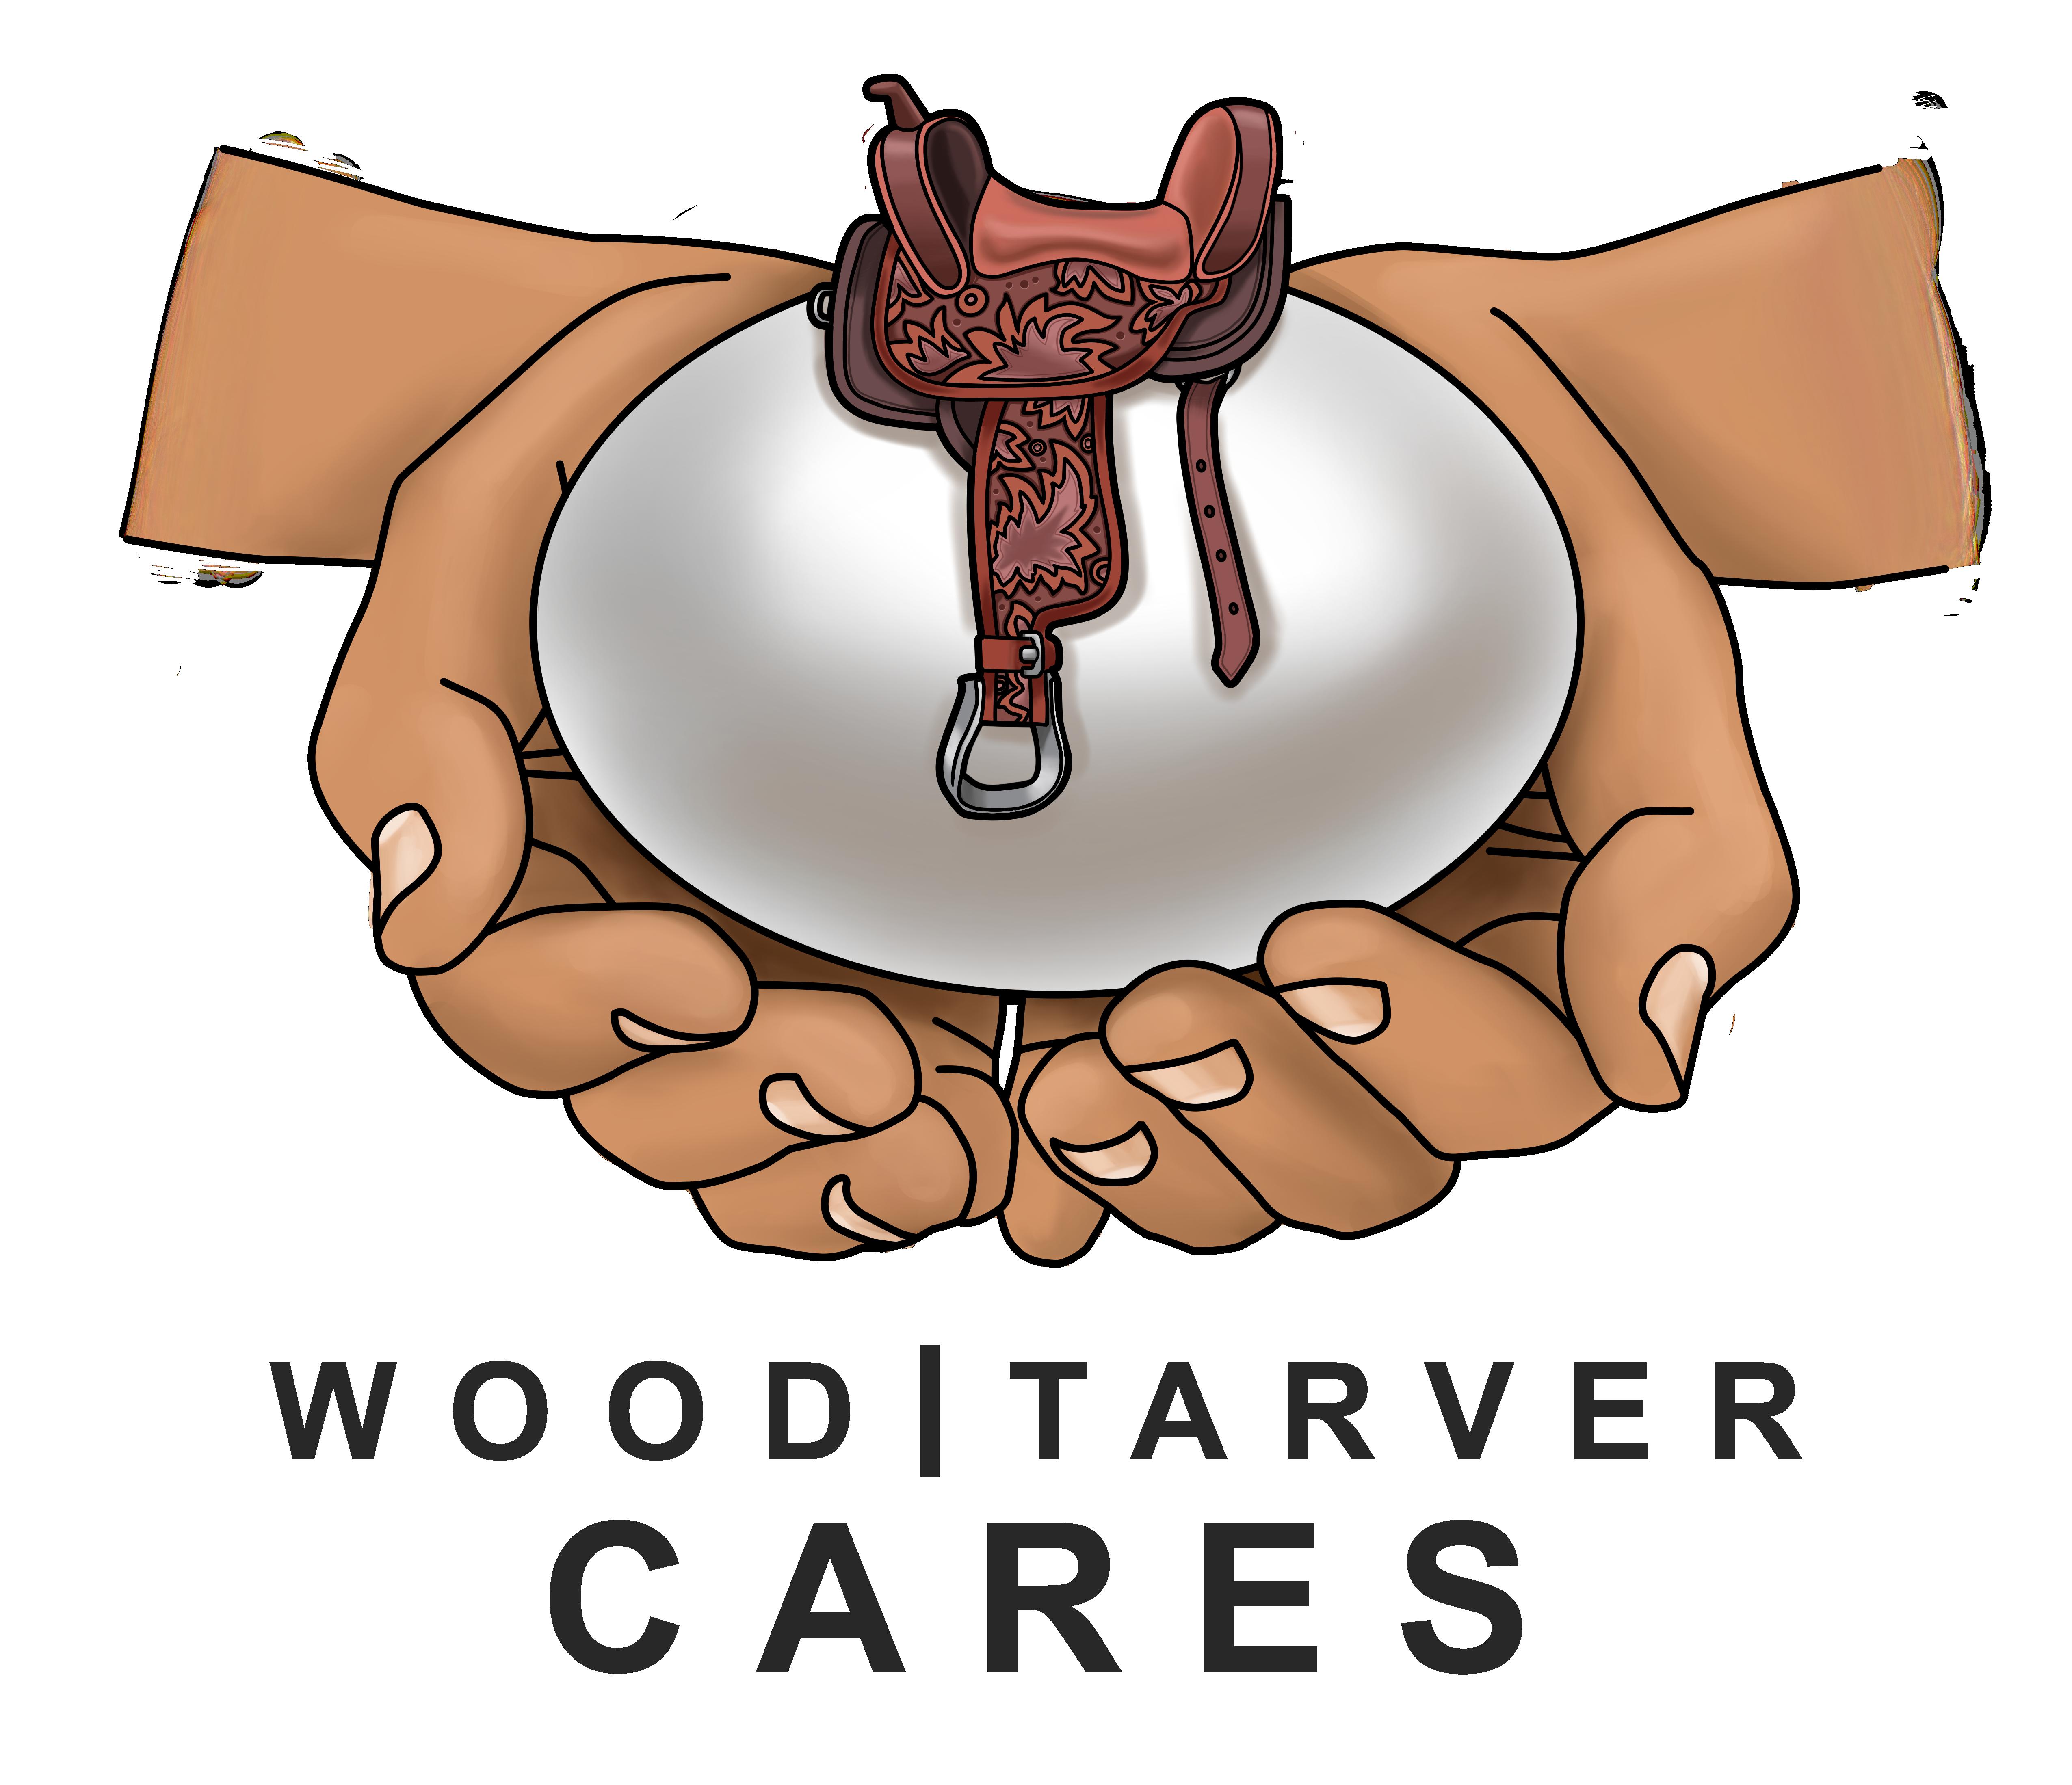 Wood Tarver Cares-Nests Egg Boise, ID | Wood Tarver Financial